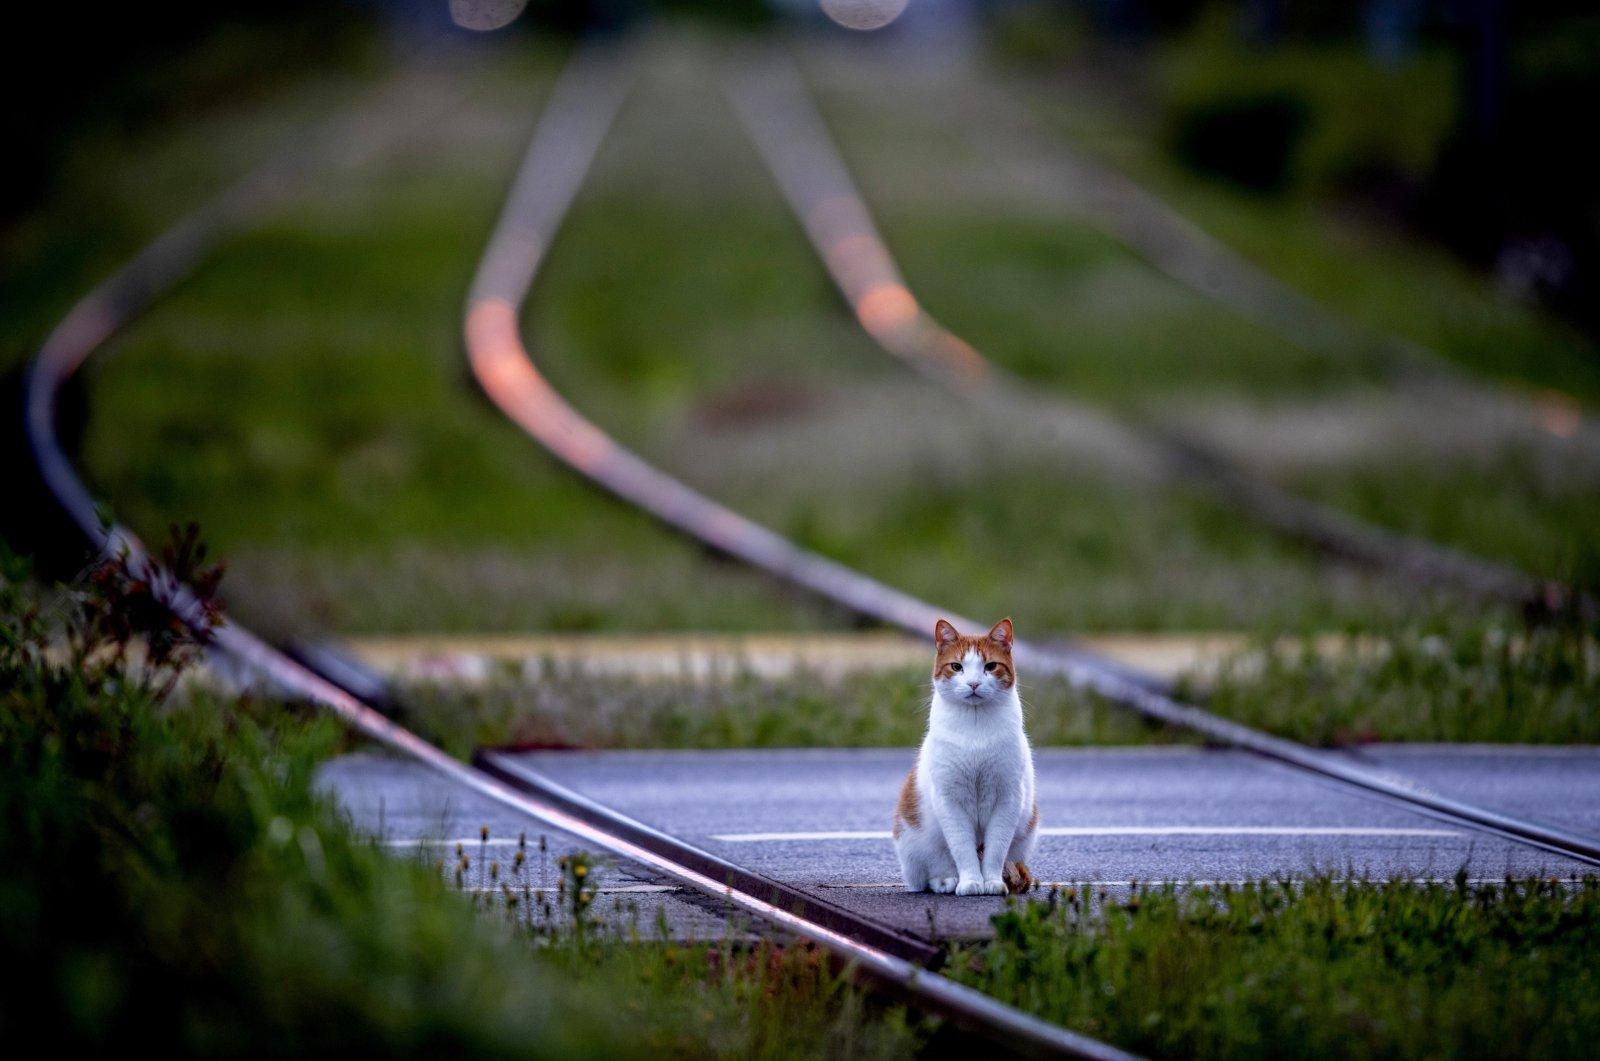 A cat sits between train tracks in Frankfurt, Germany, May 23, 2021. (AP Photo)